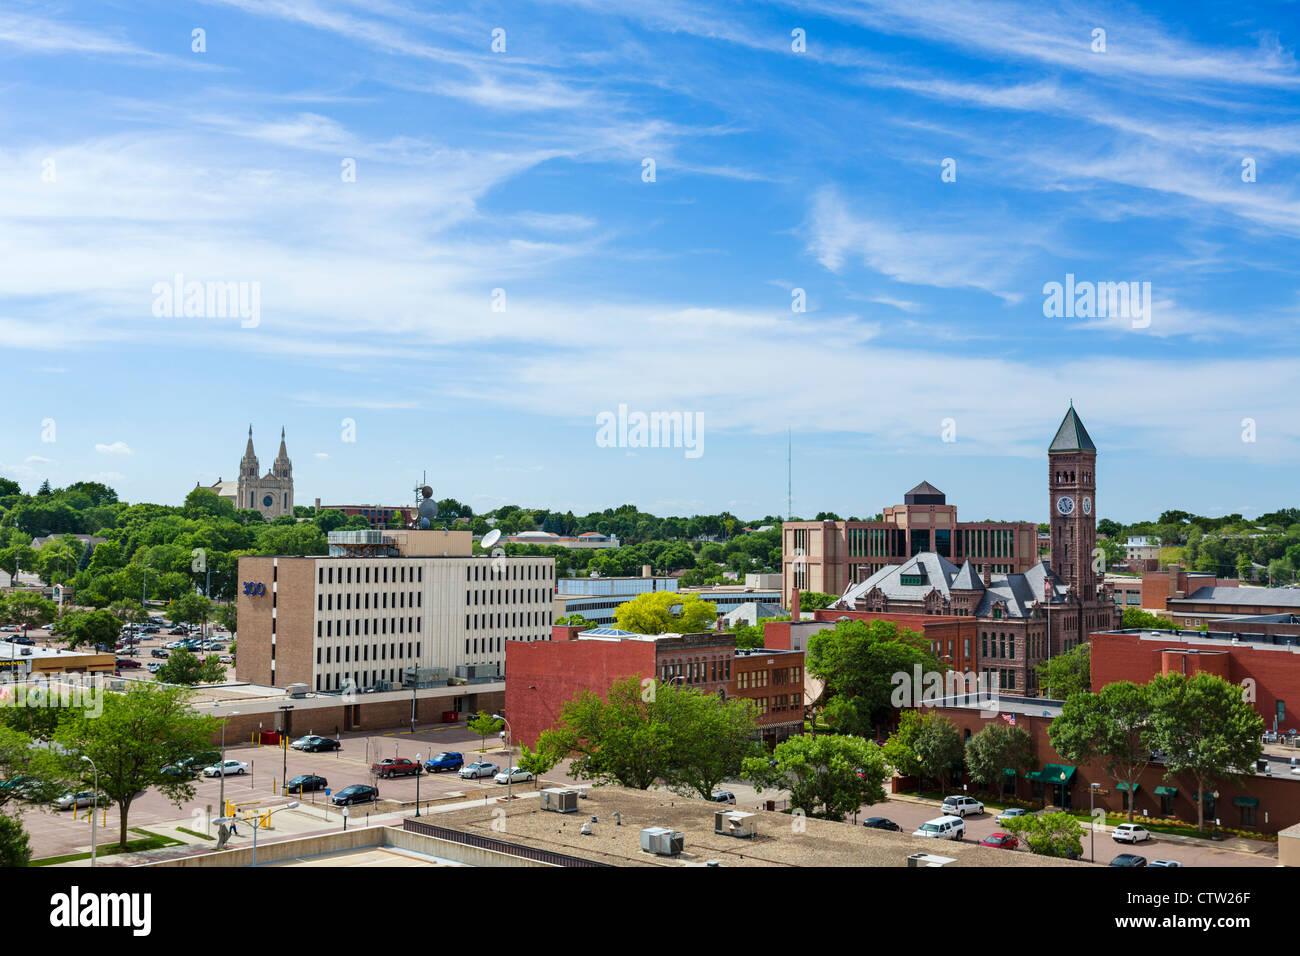 View over downtown Sioux Falls, South Dakota, USA - Stock Image